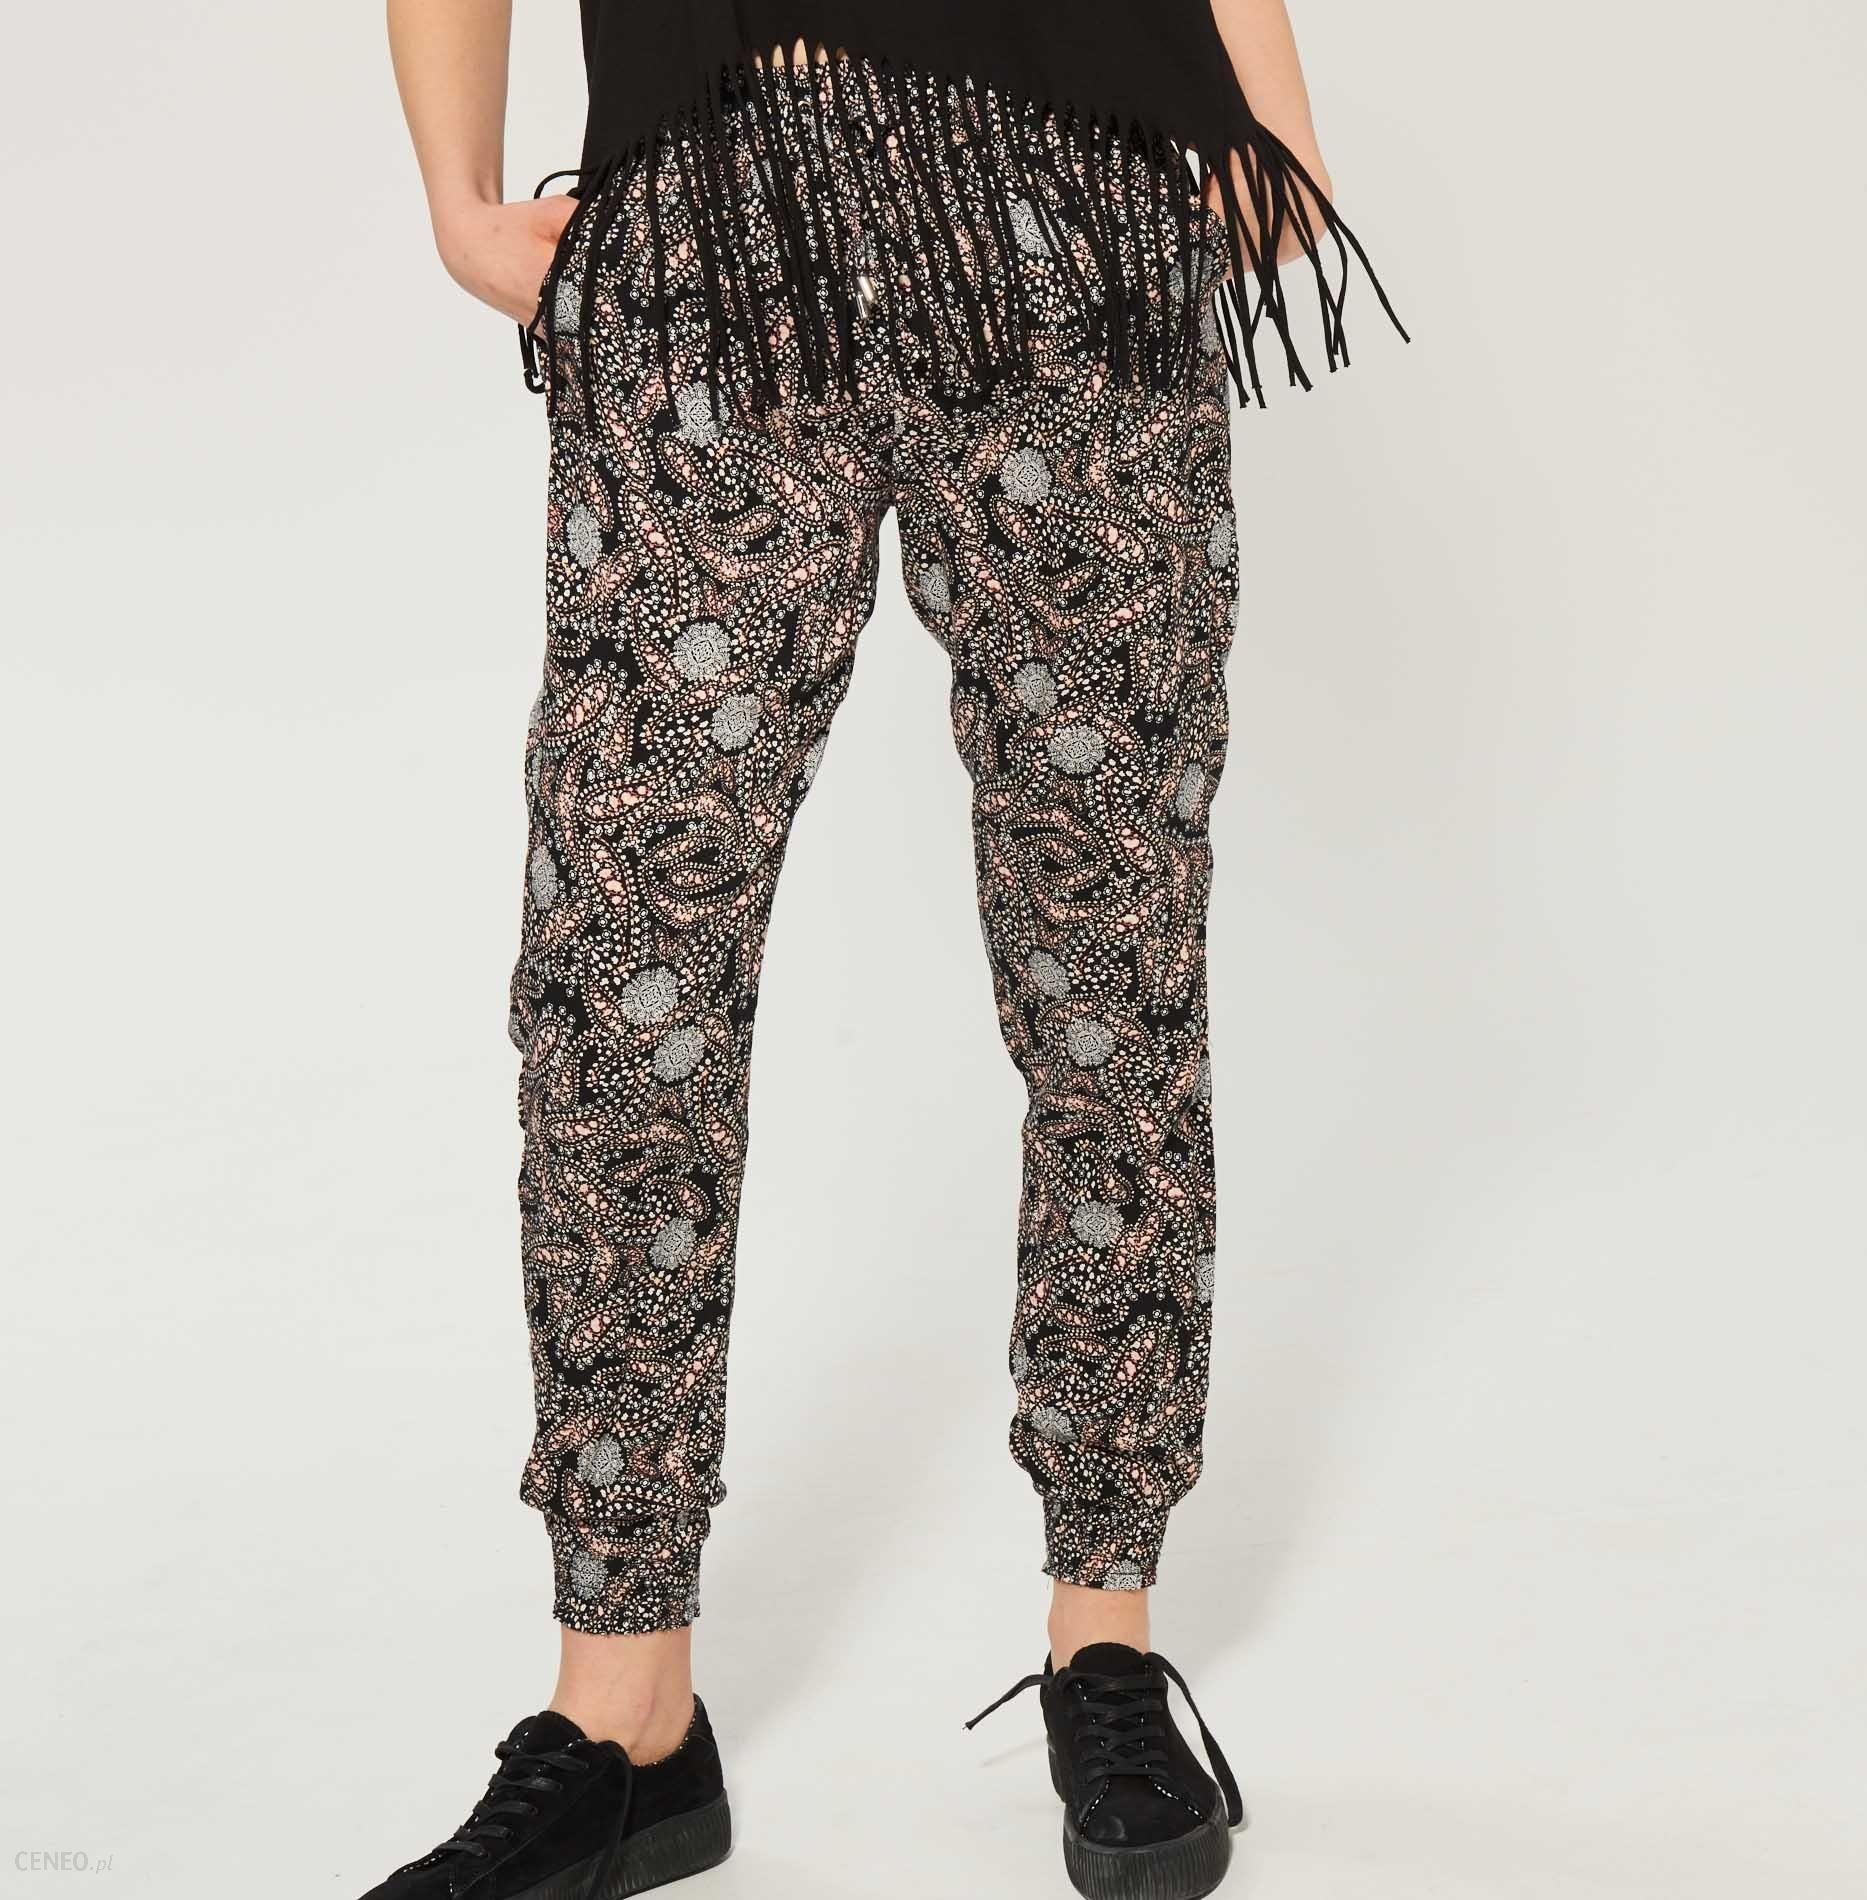 28a6d2cfdbe400 Sinsay - Materiałowe spodnie na lato - Wielobarwn - damski - Ceny i ...